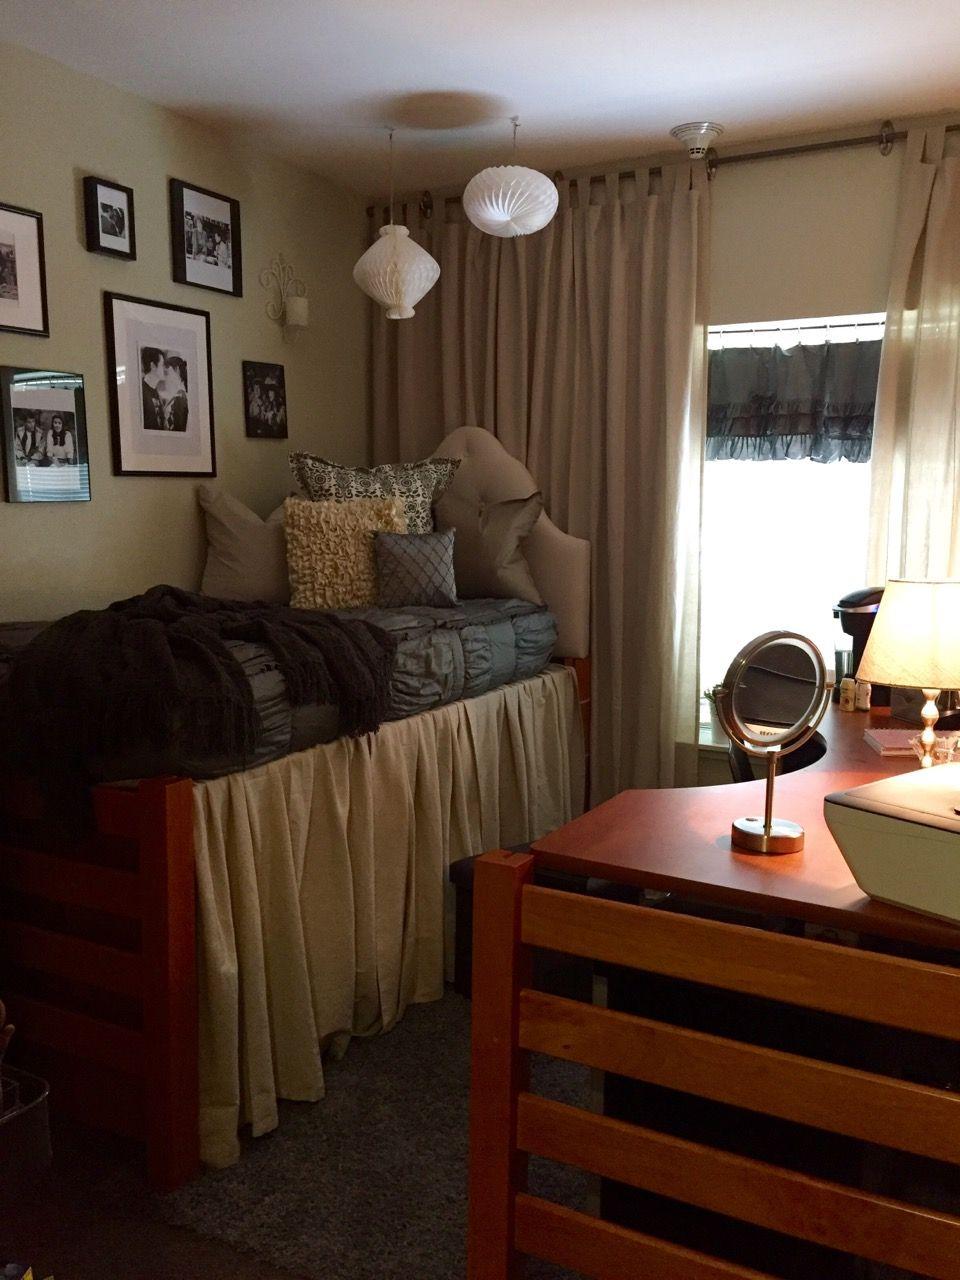 Dorm room furniture layout - Cozy Dorm Bedroom At The University Of Arkansas Hannah Grace S Dorm Room